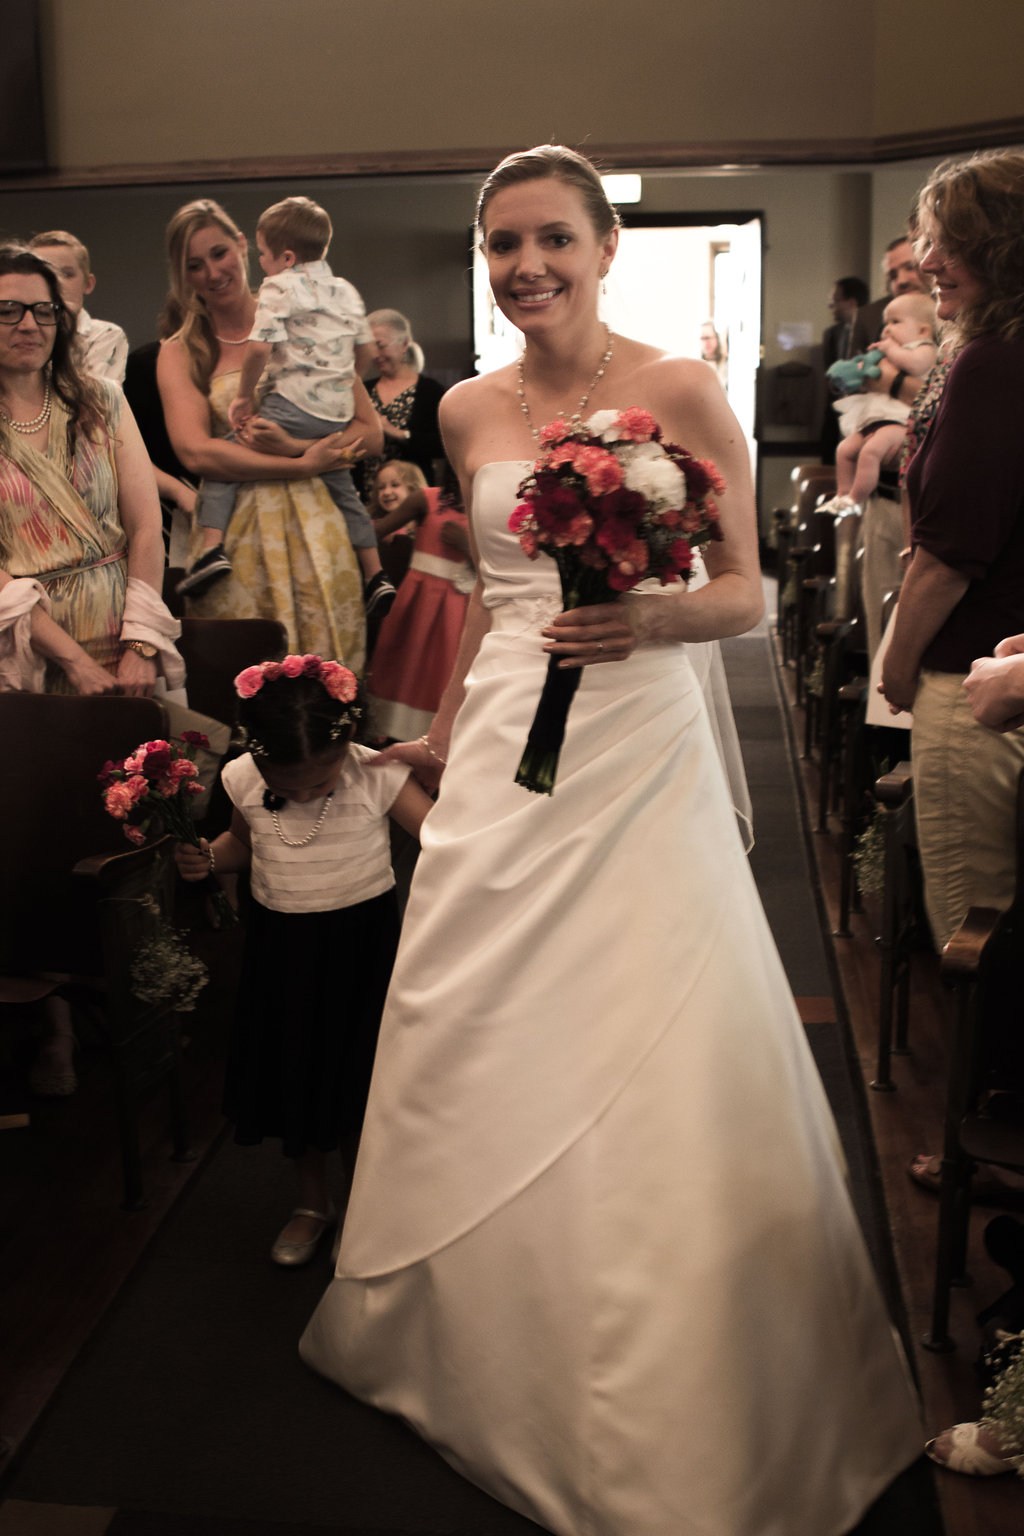 jakeandsuze_weddingselects-60.jpg